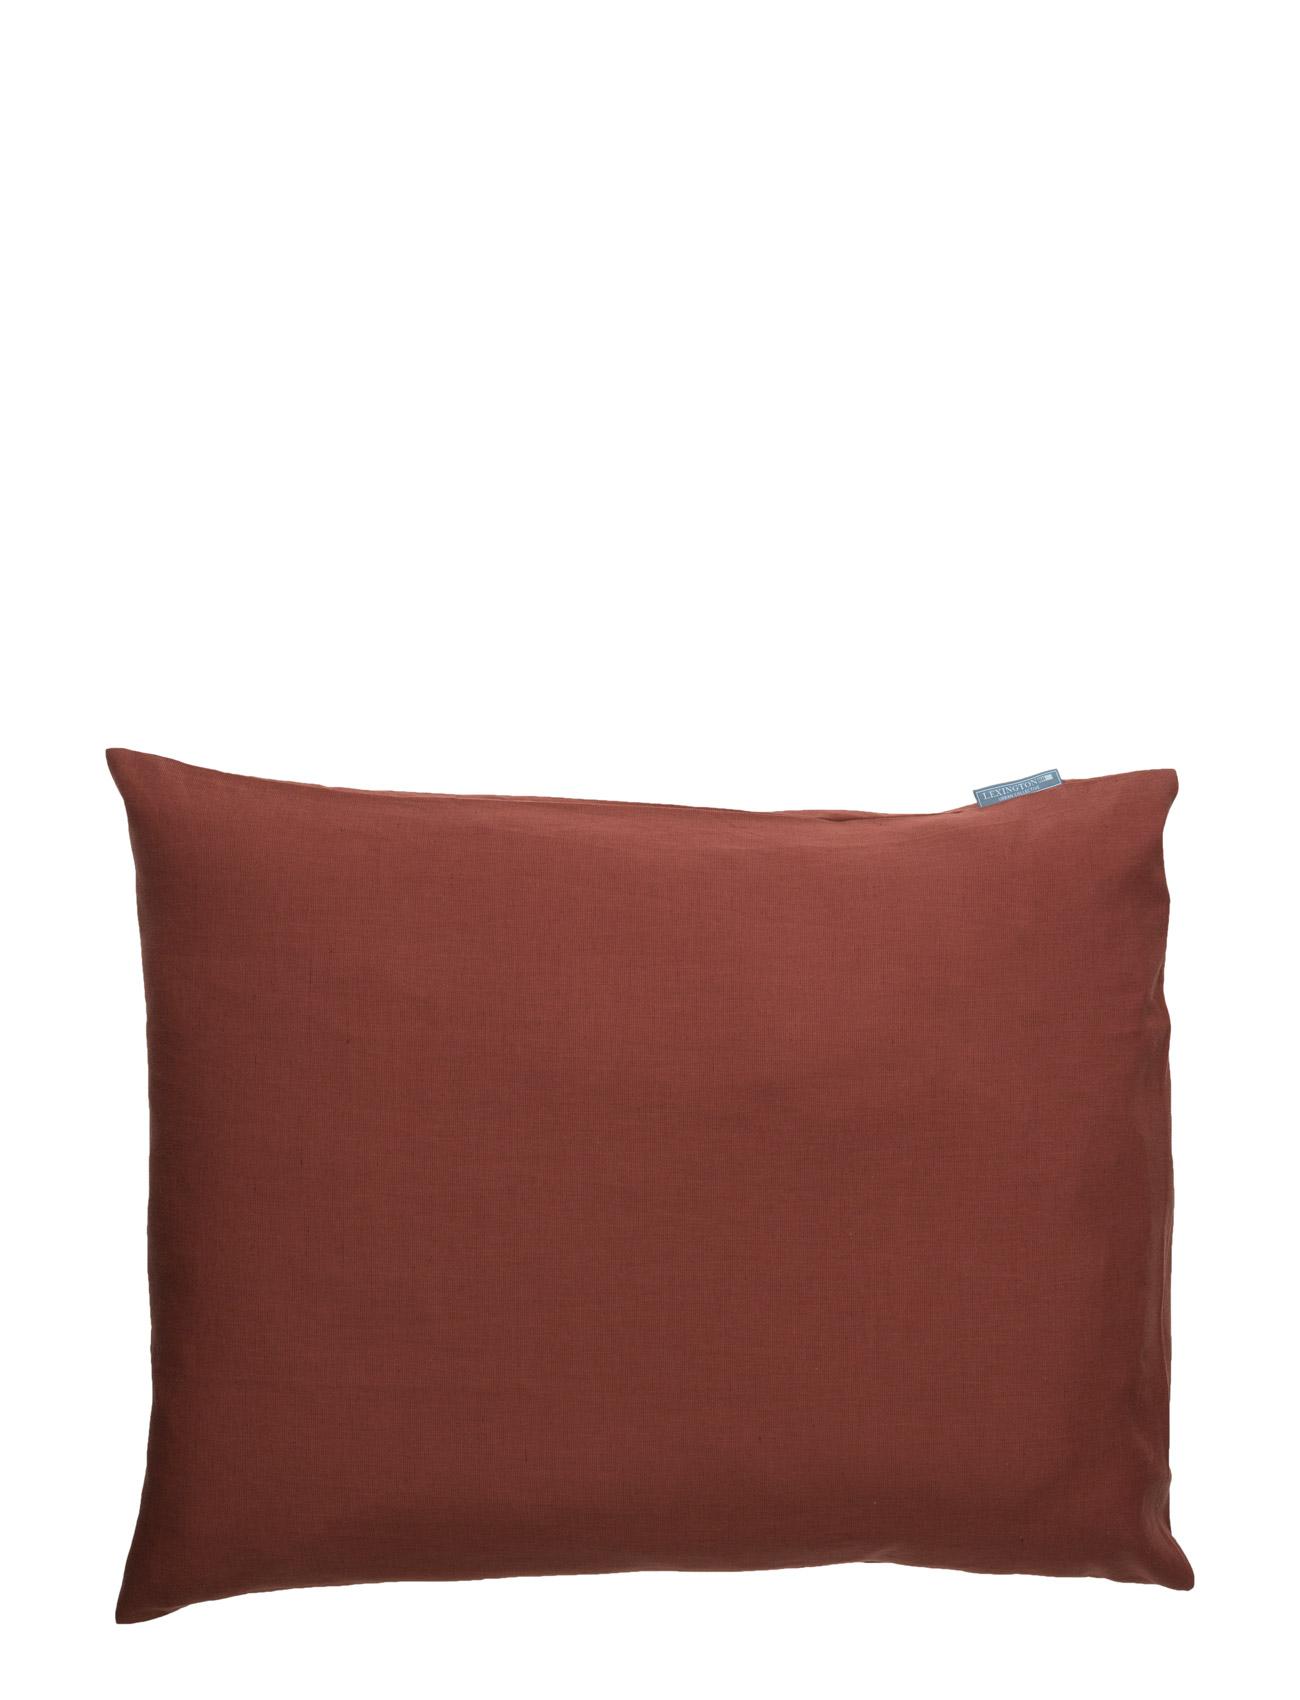 Urban Rust Coli Pillowcase Lexington Company Home Accessories til Unisex i Rust